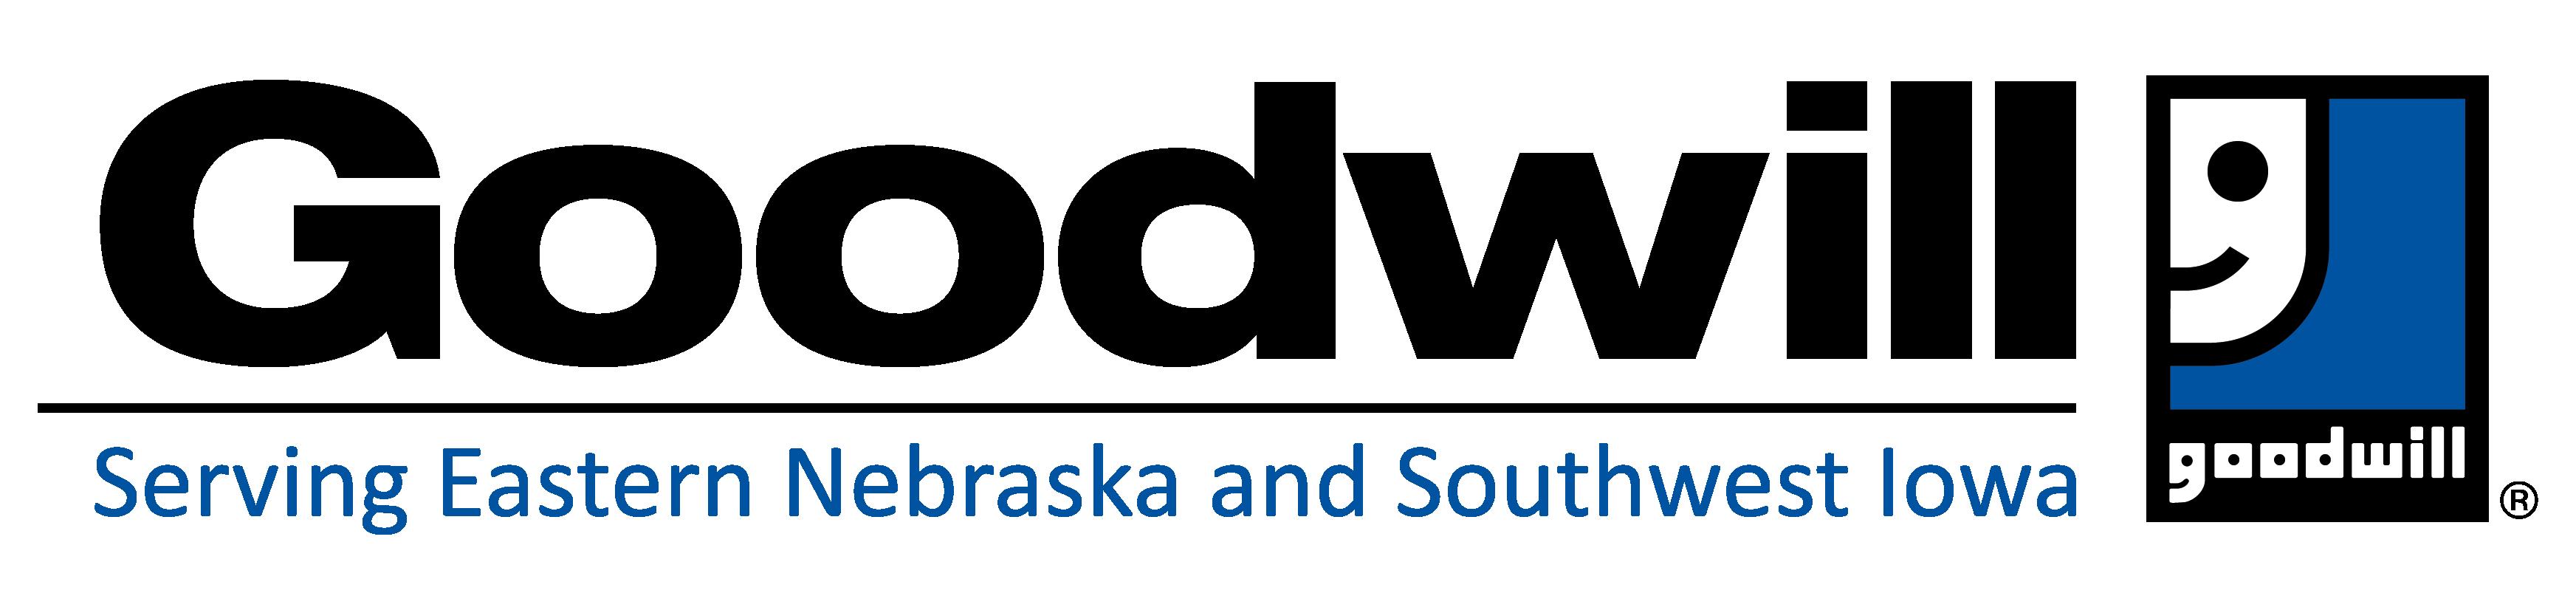 Goodwill Industries, Inc. (Goodwill Omaha) logo